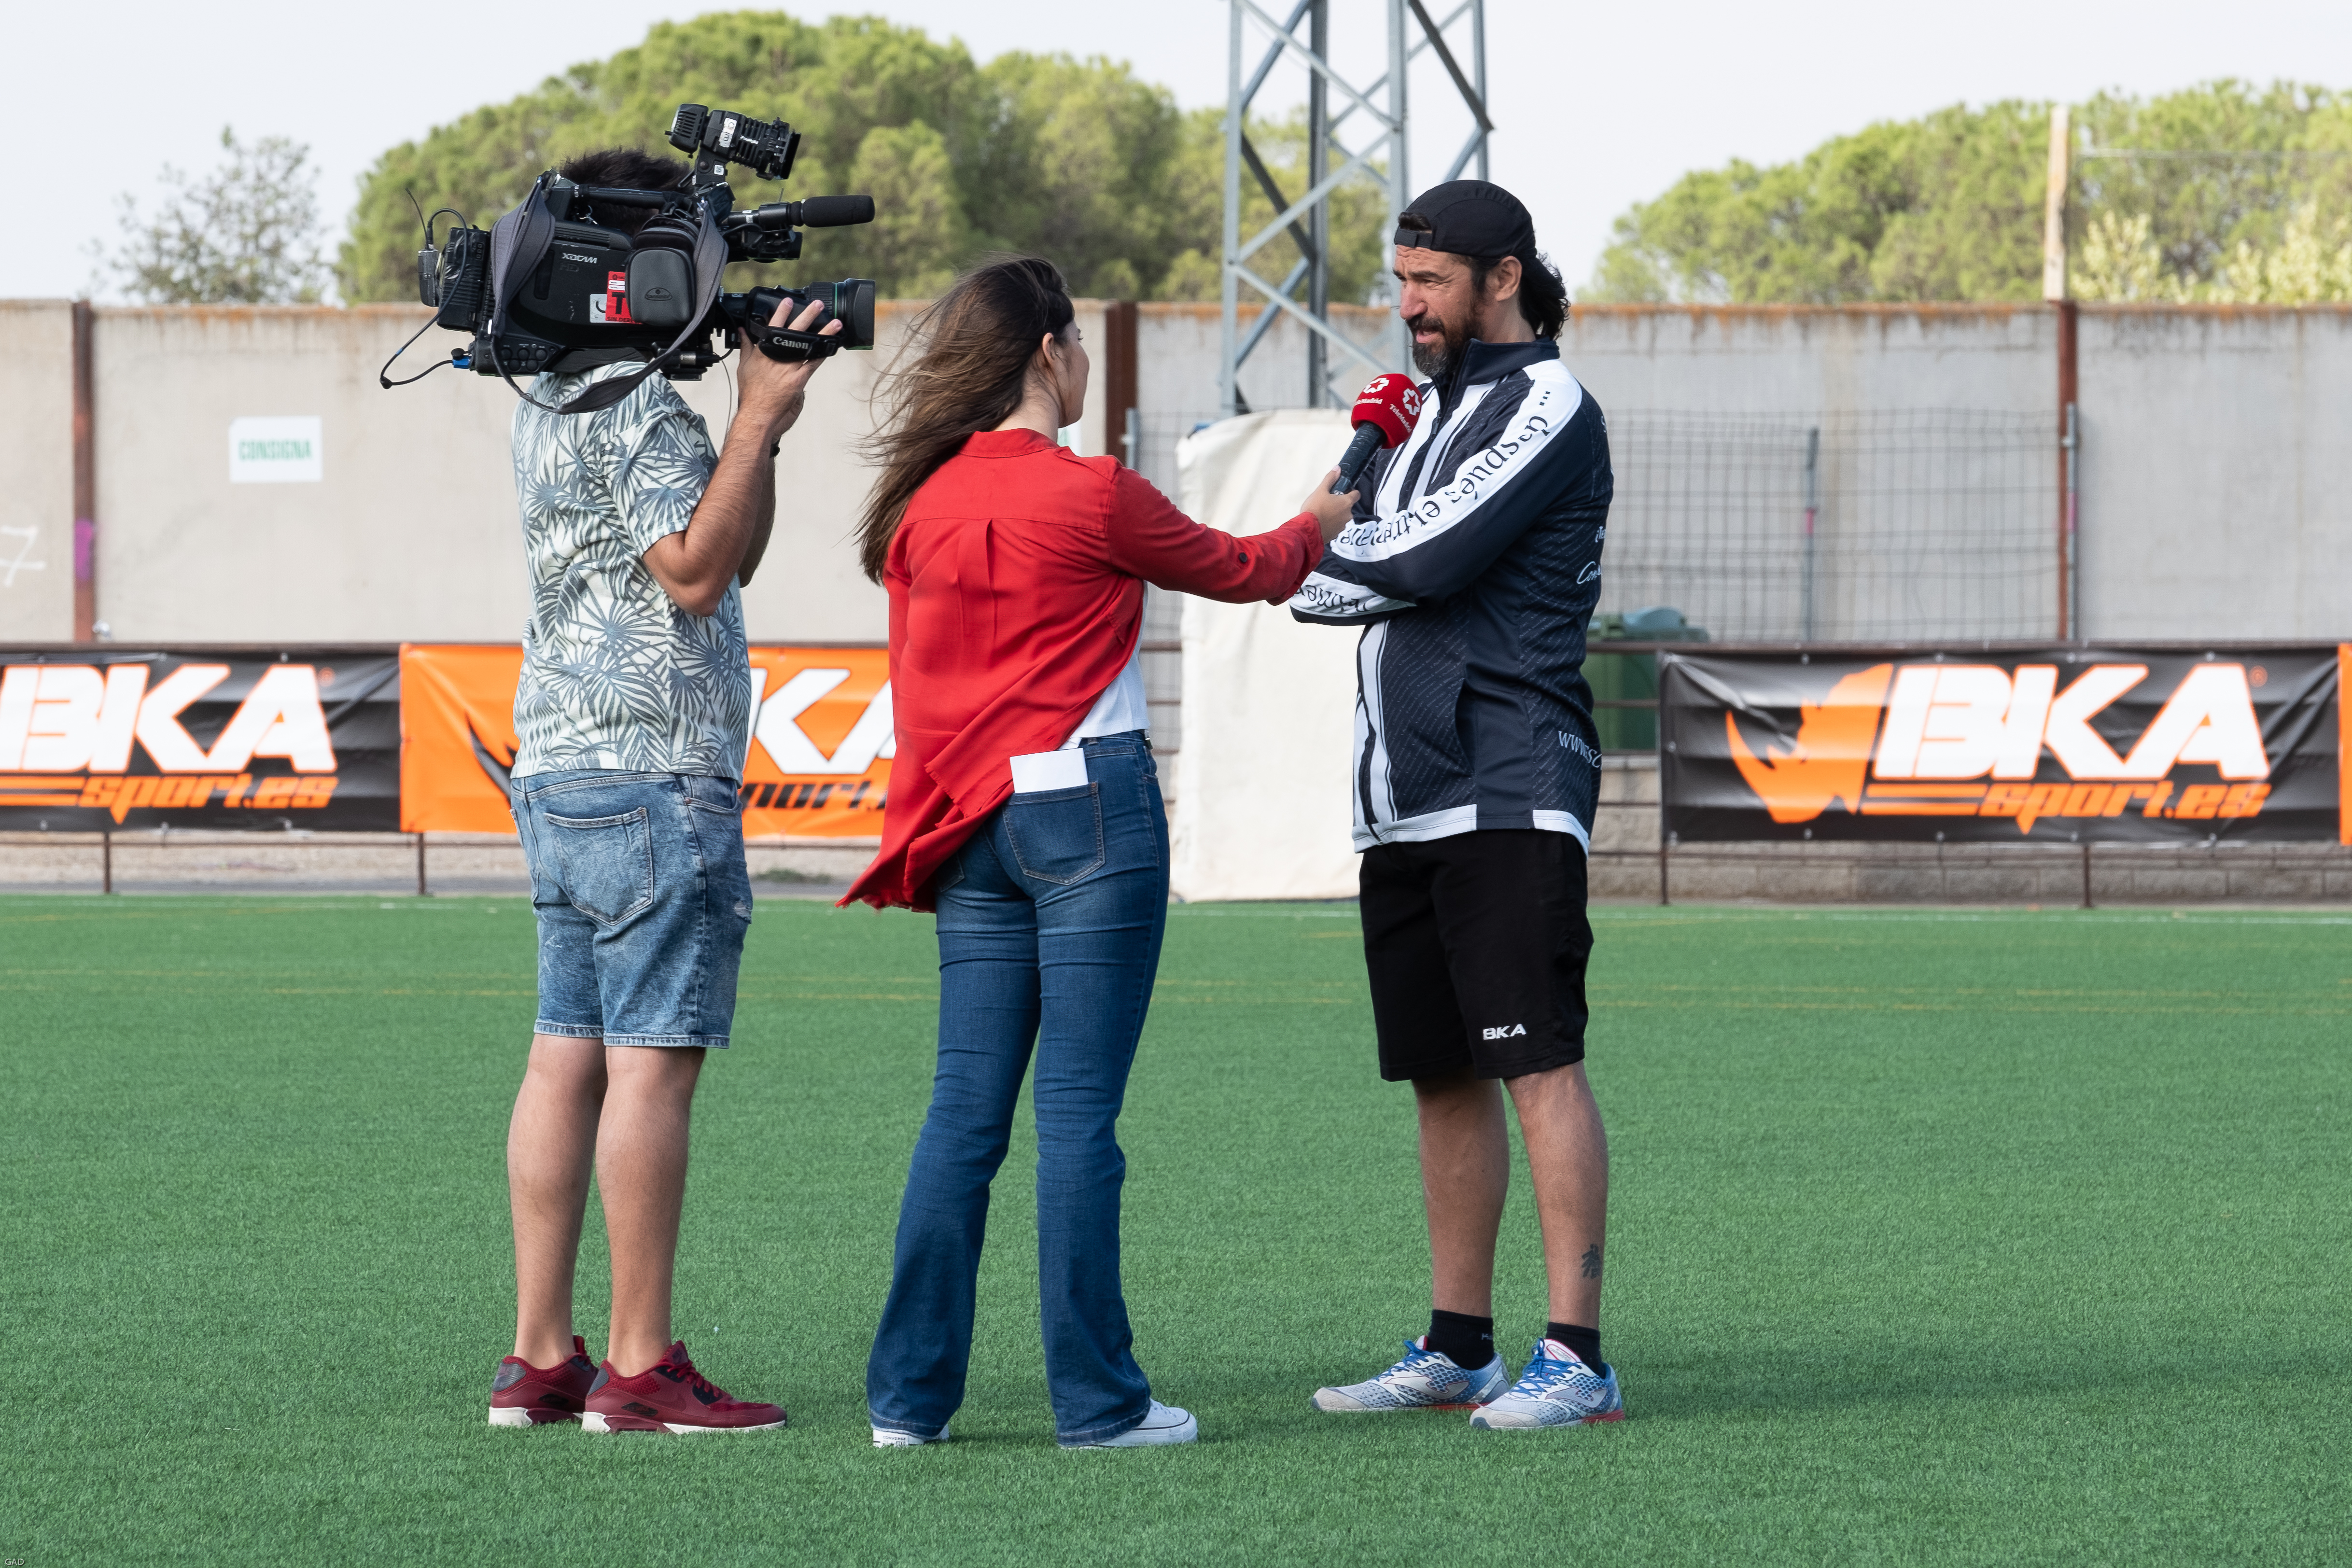 Entrevista de Telemadrid a Sergio Pachon